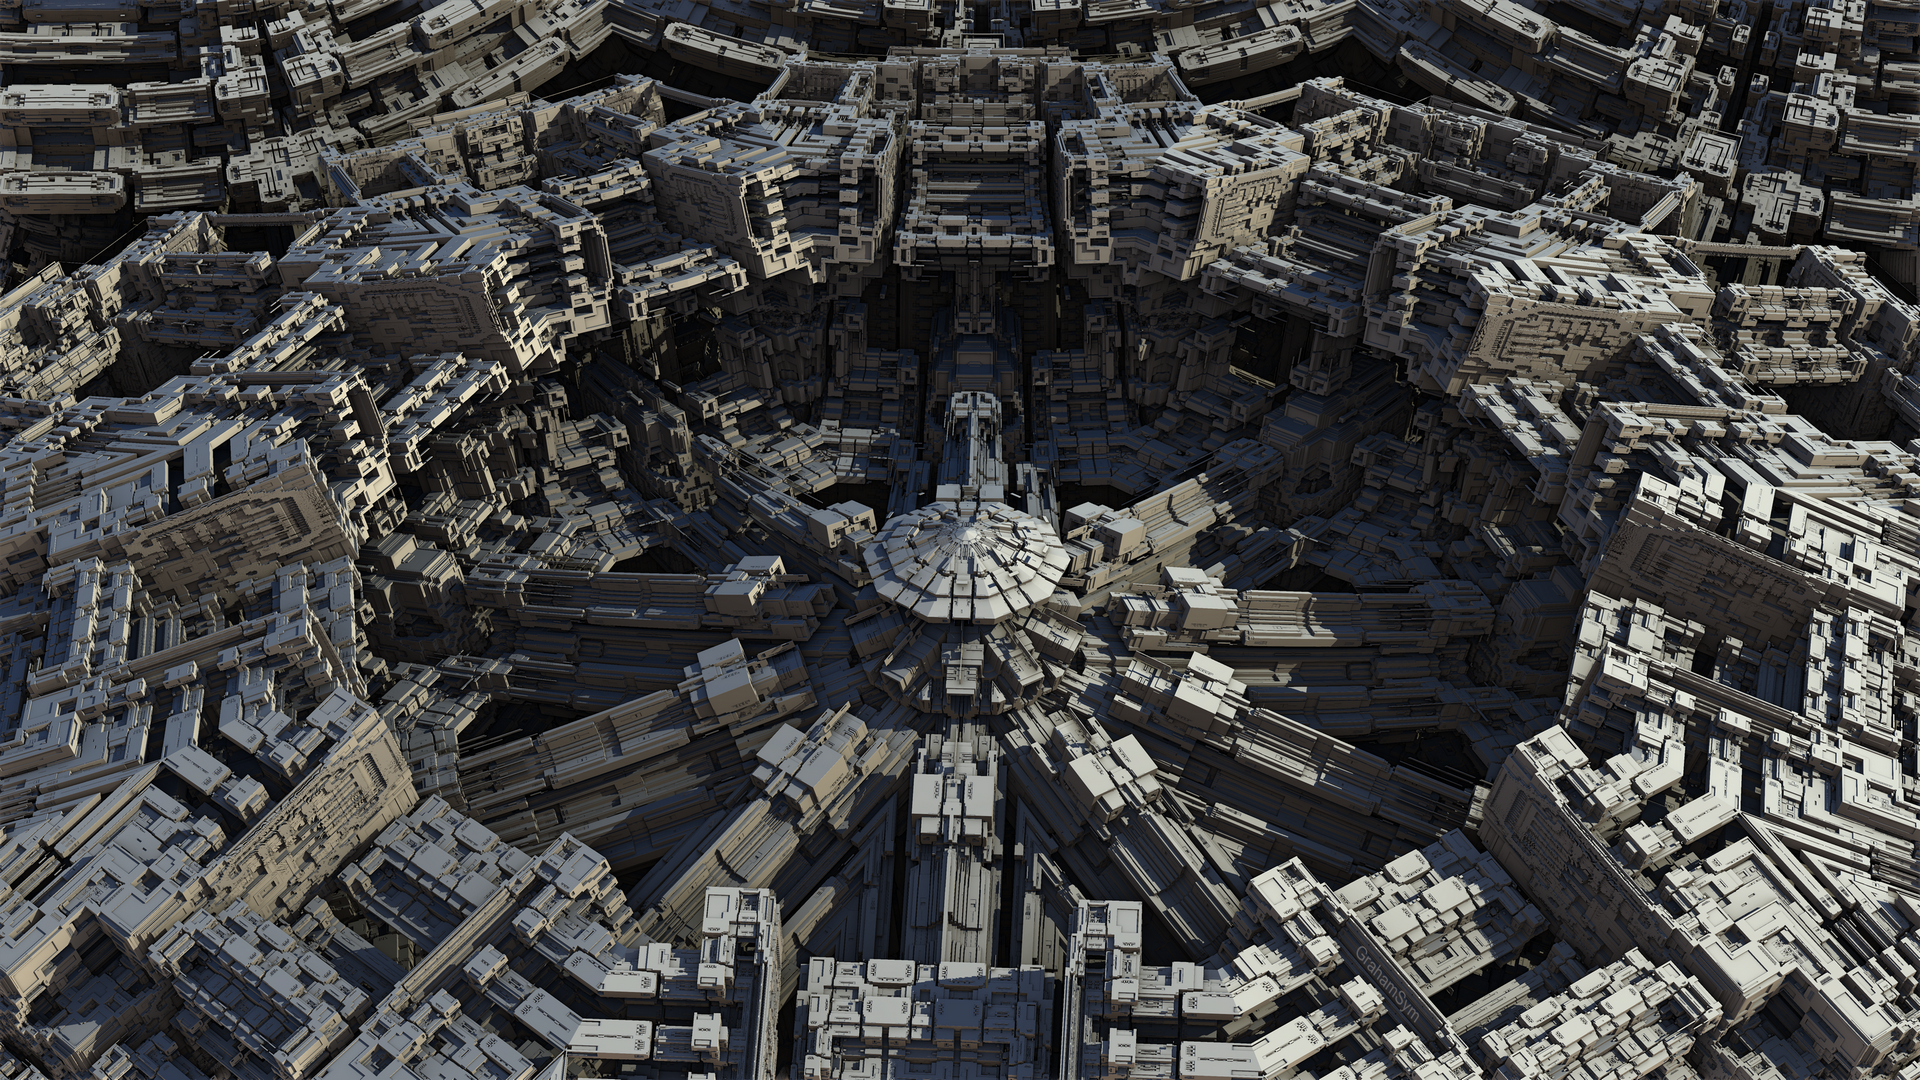 Centrifuge by GrahamSym